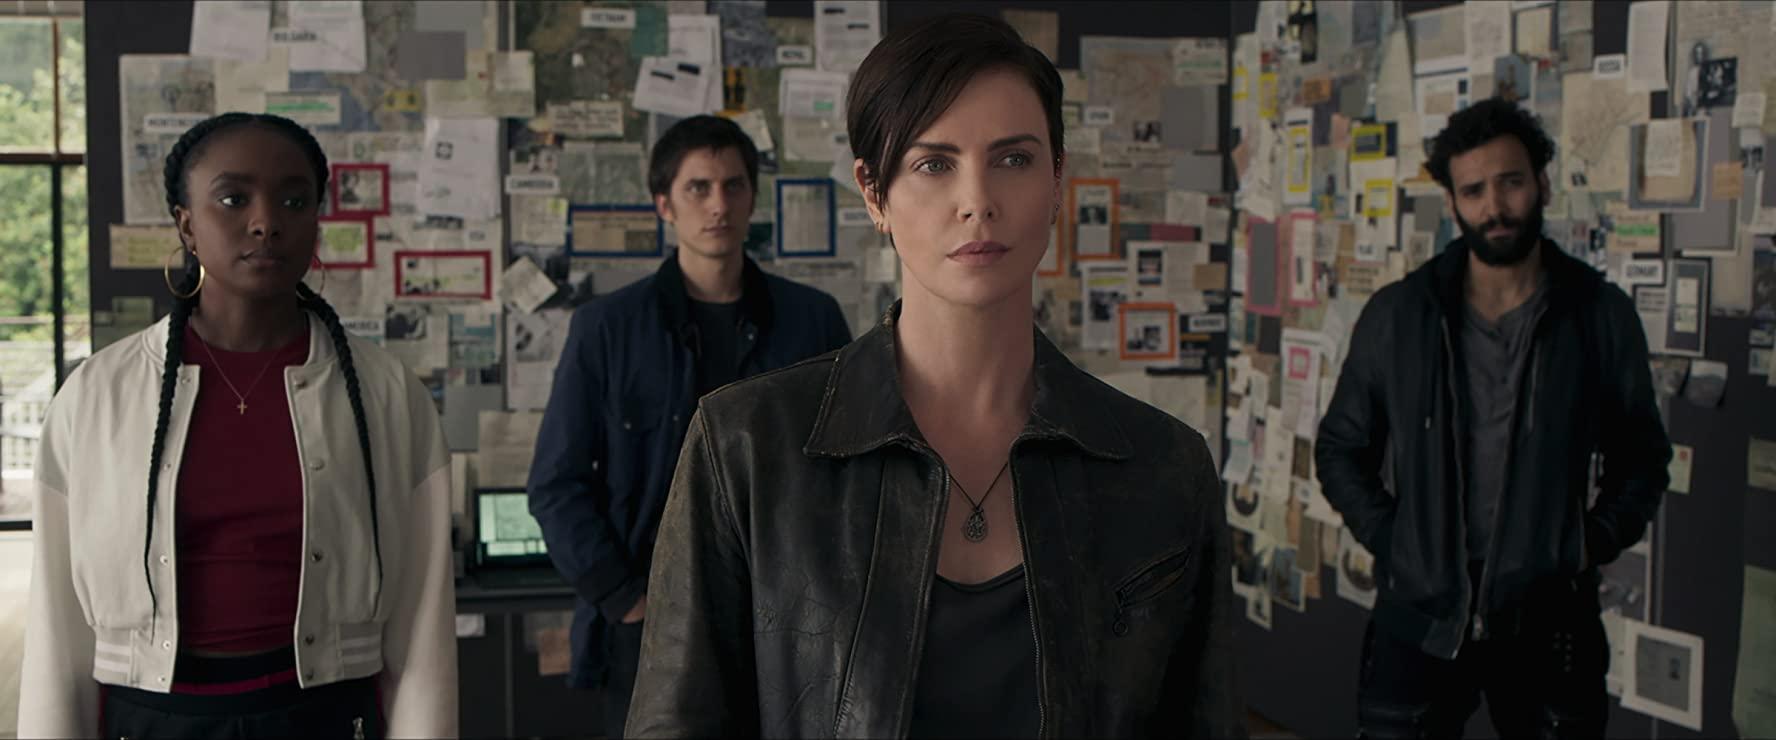 مشاهدة فيلم The Old Guard (2020) مترجم HD اون لاين